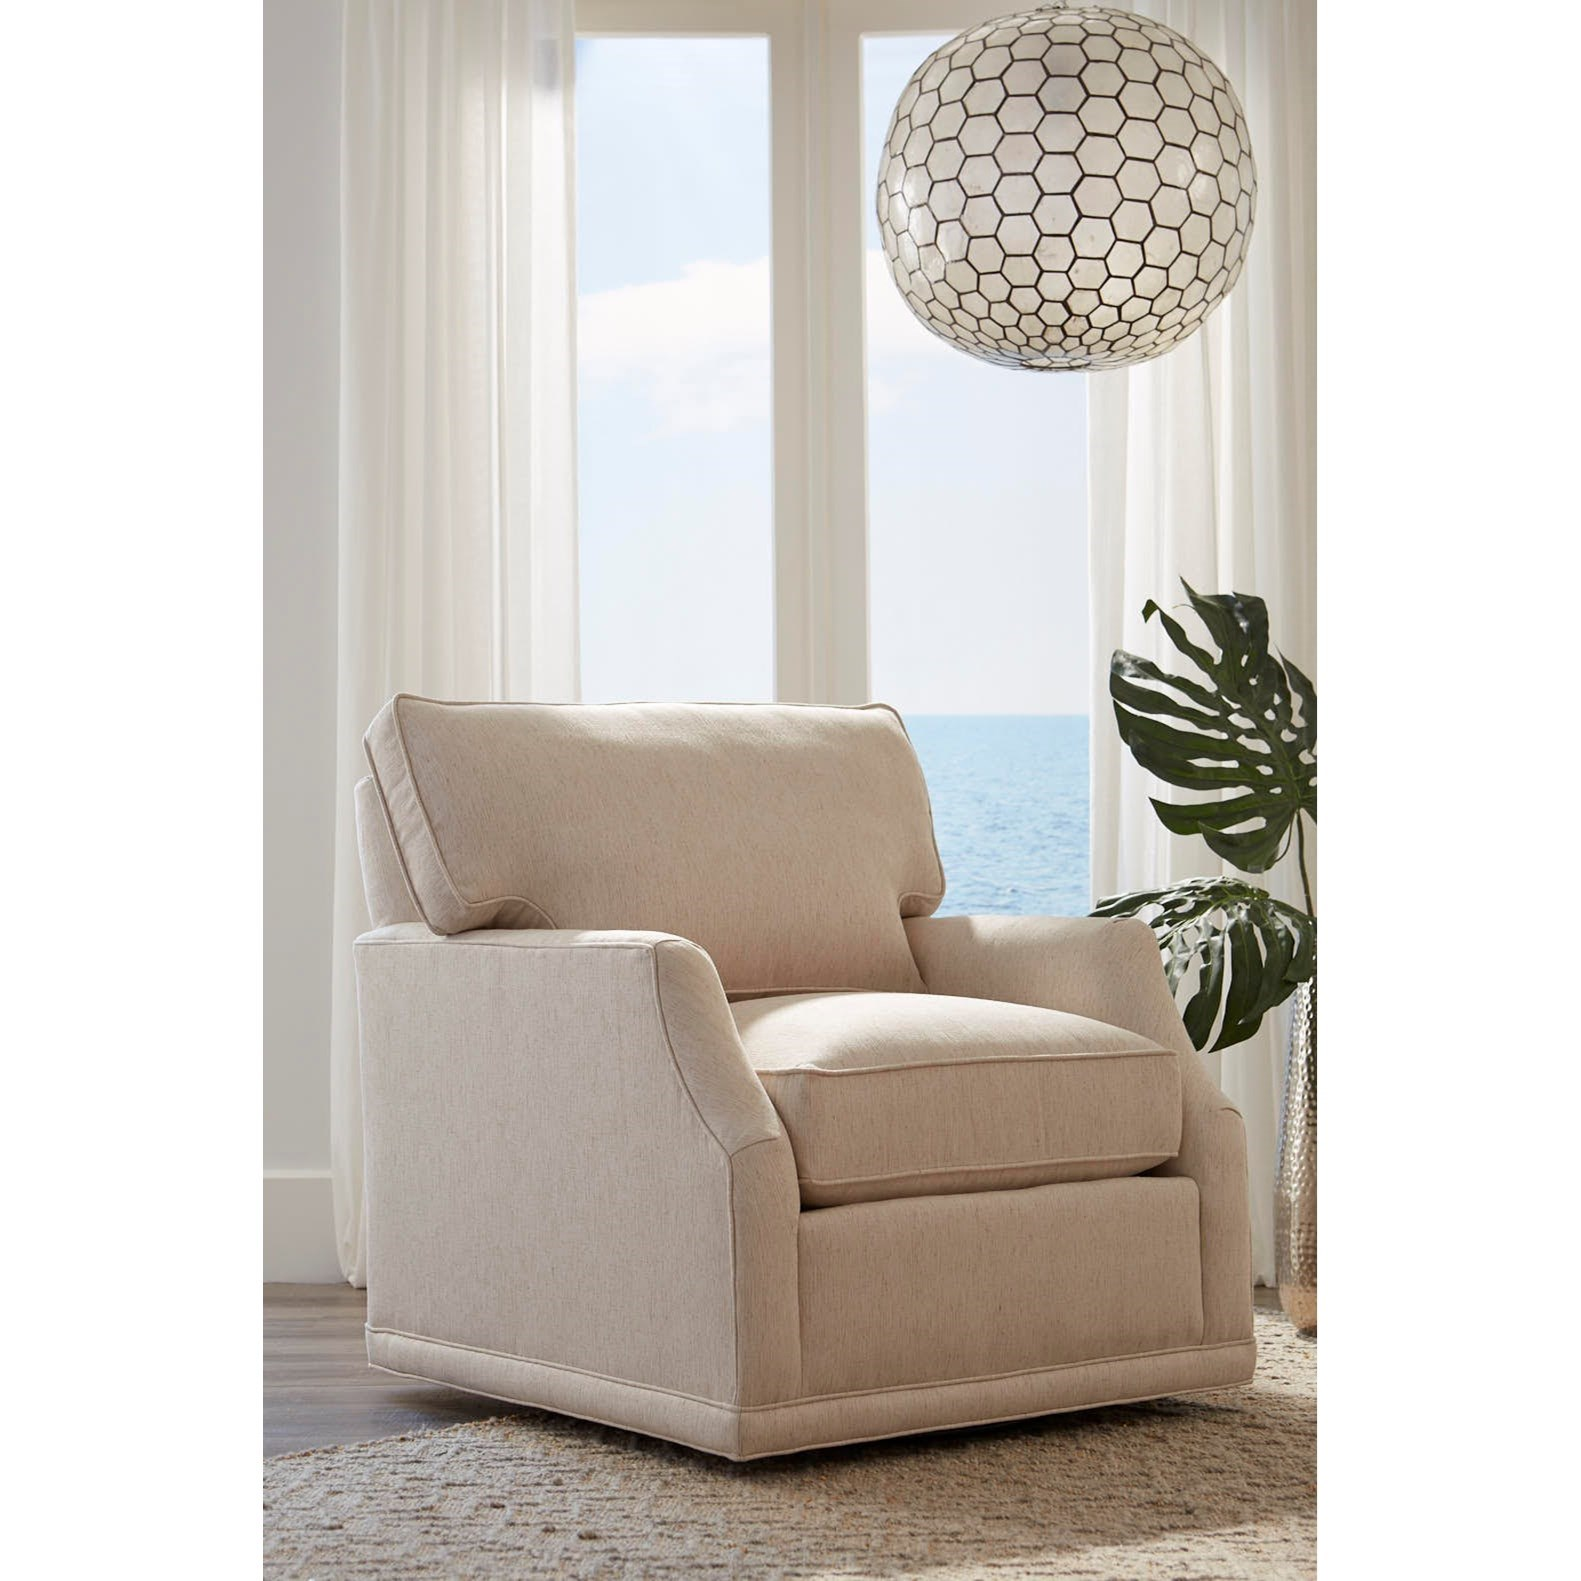 Rowe My Style II Customizable Swivel Chair - Item Number: AS200-B-016-10705-19